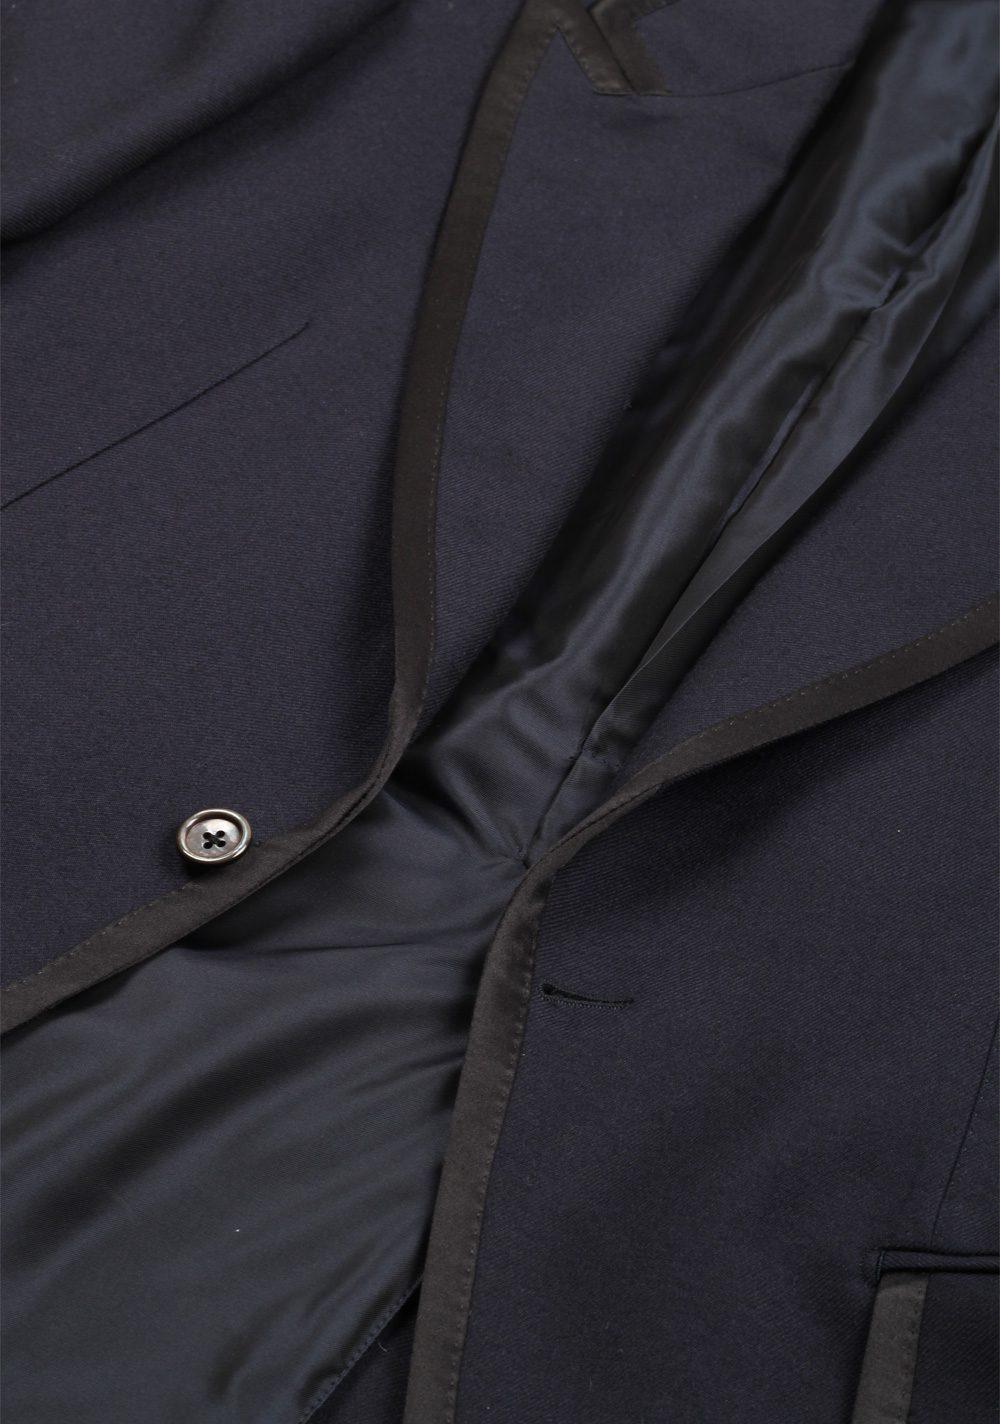 TOM FORD Shelton Blue Tuxedo Dinner Jacket Size 46 / 36R U.S. | Costume Limité